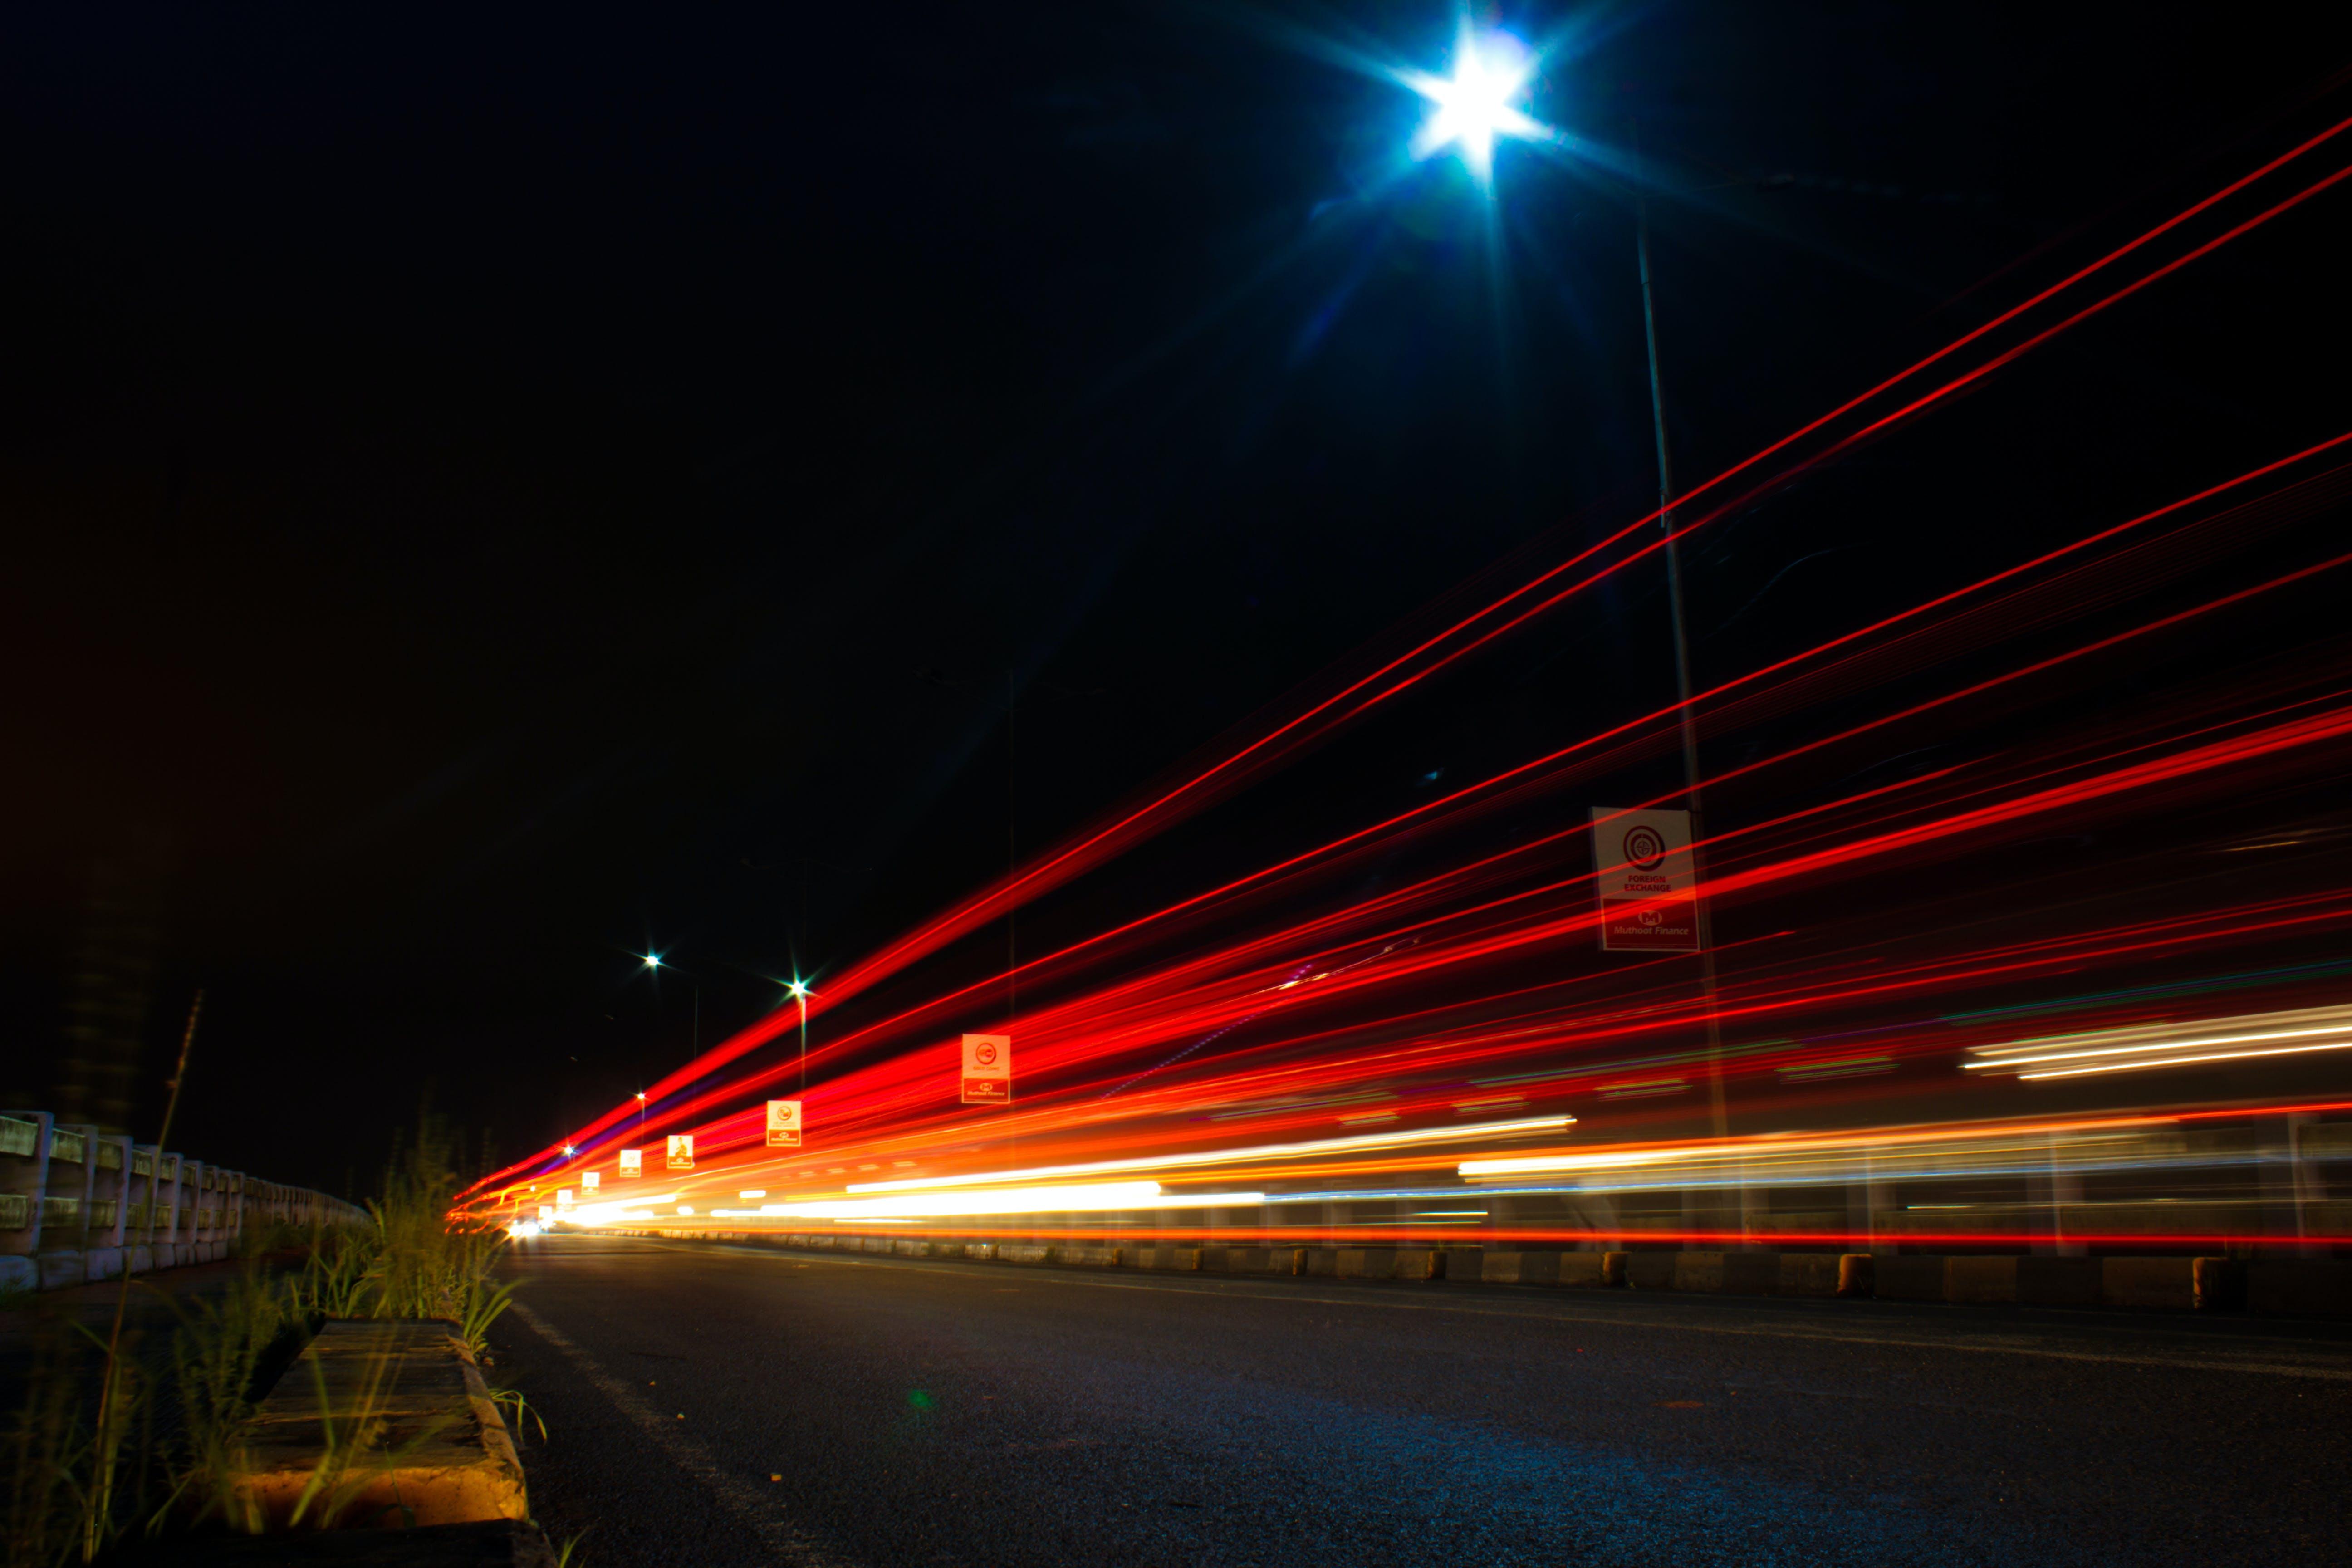 Free stock photo of light beam, light rales, long exposure, red